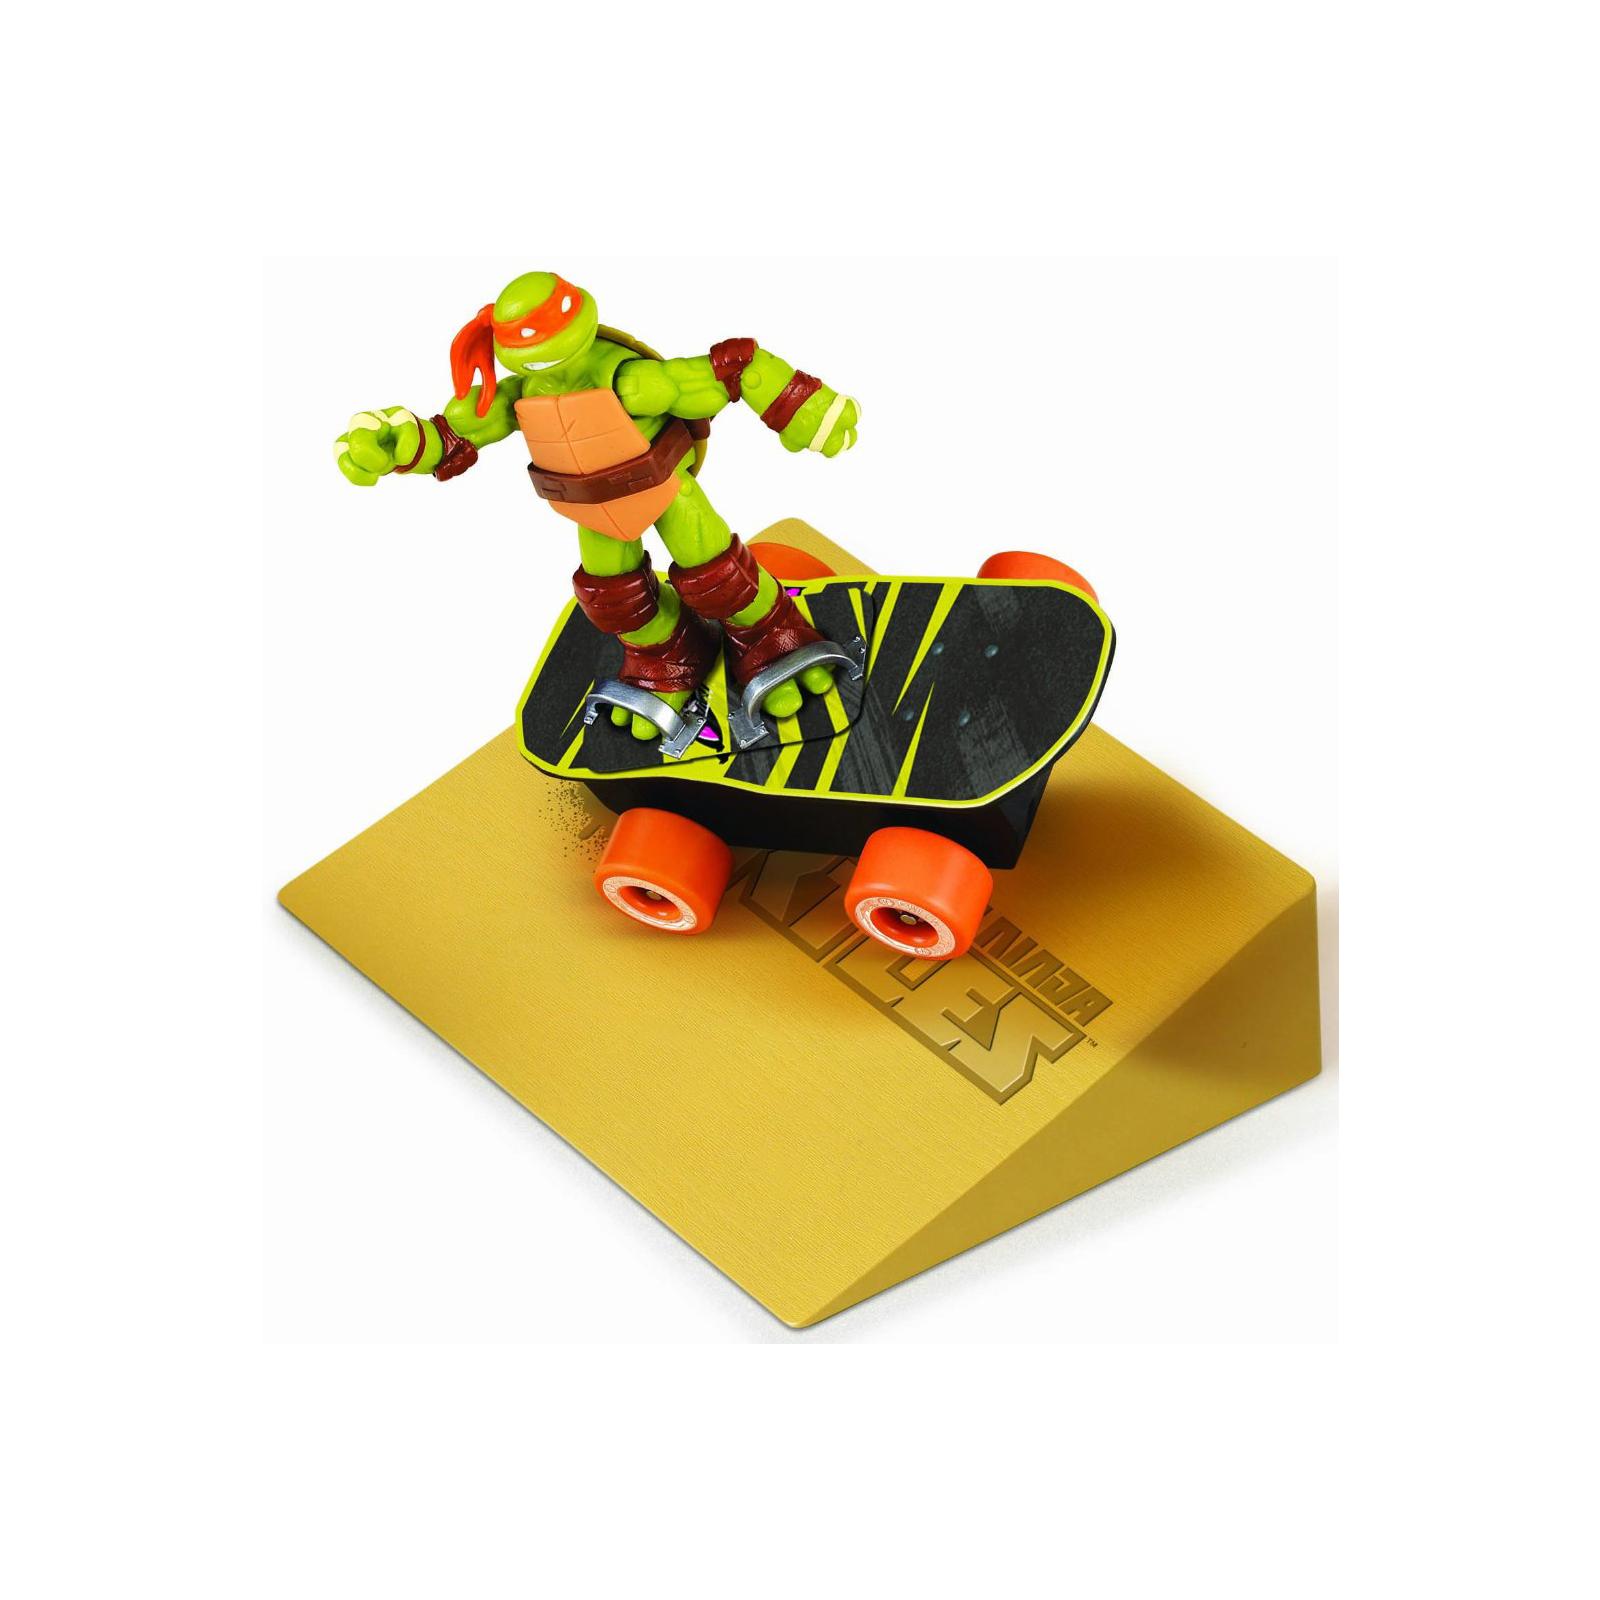 Игровой набор Playmates Черепашки Ниндзя Скейтборд (без фигурки)